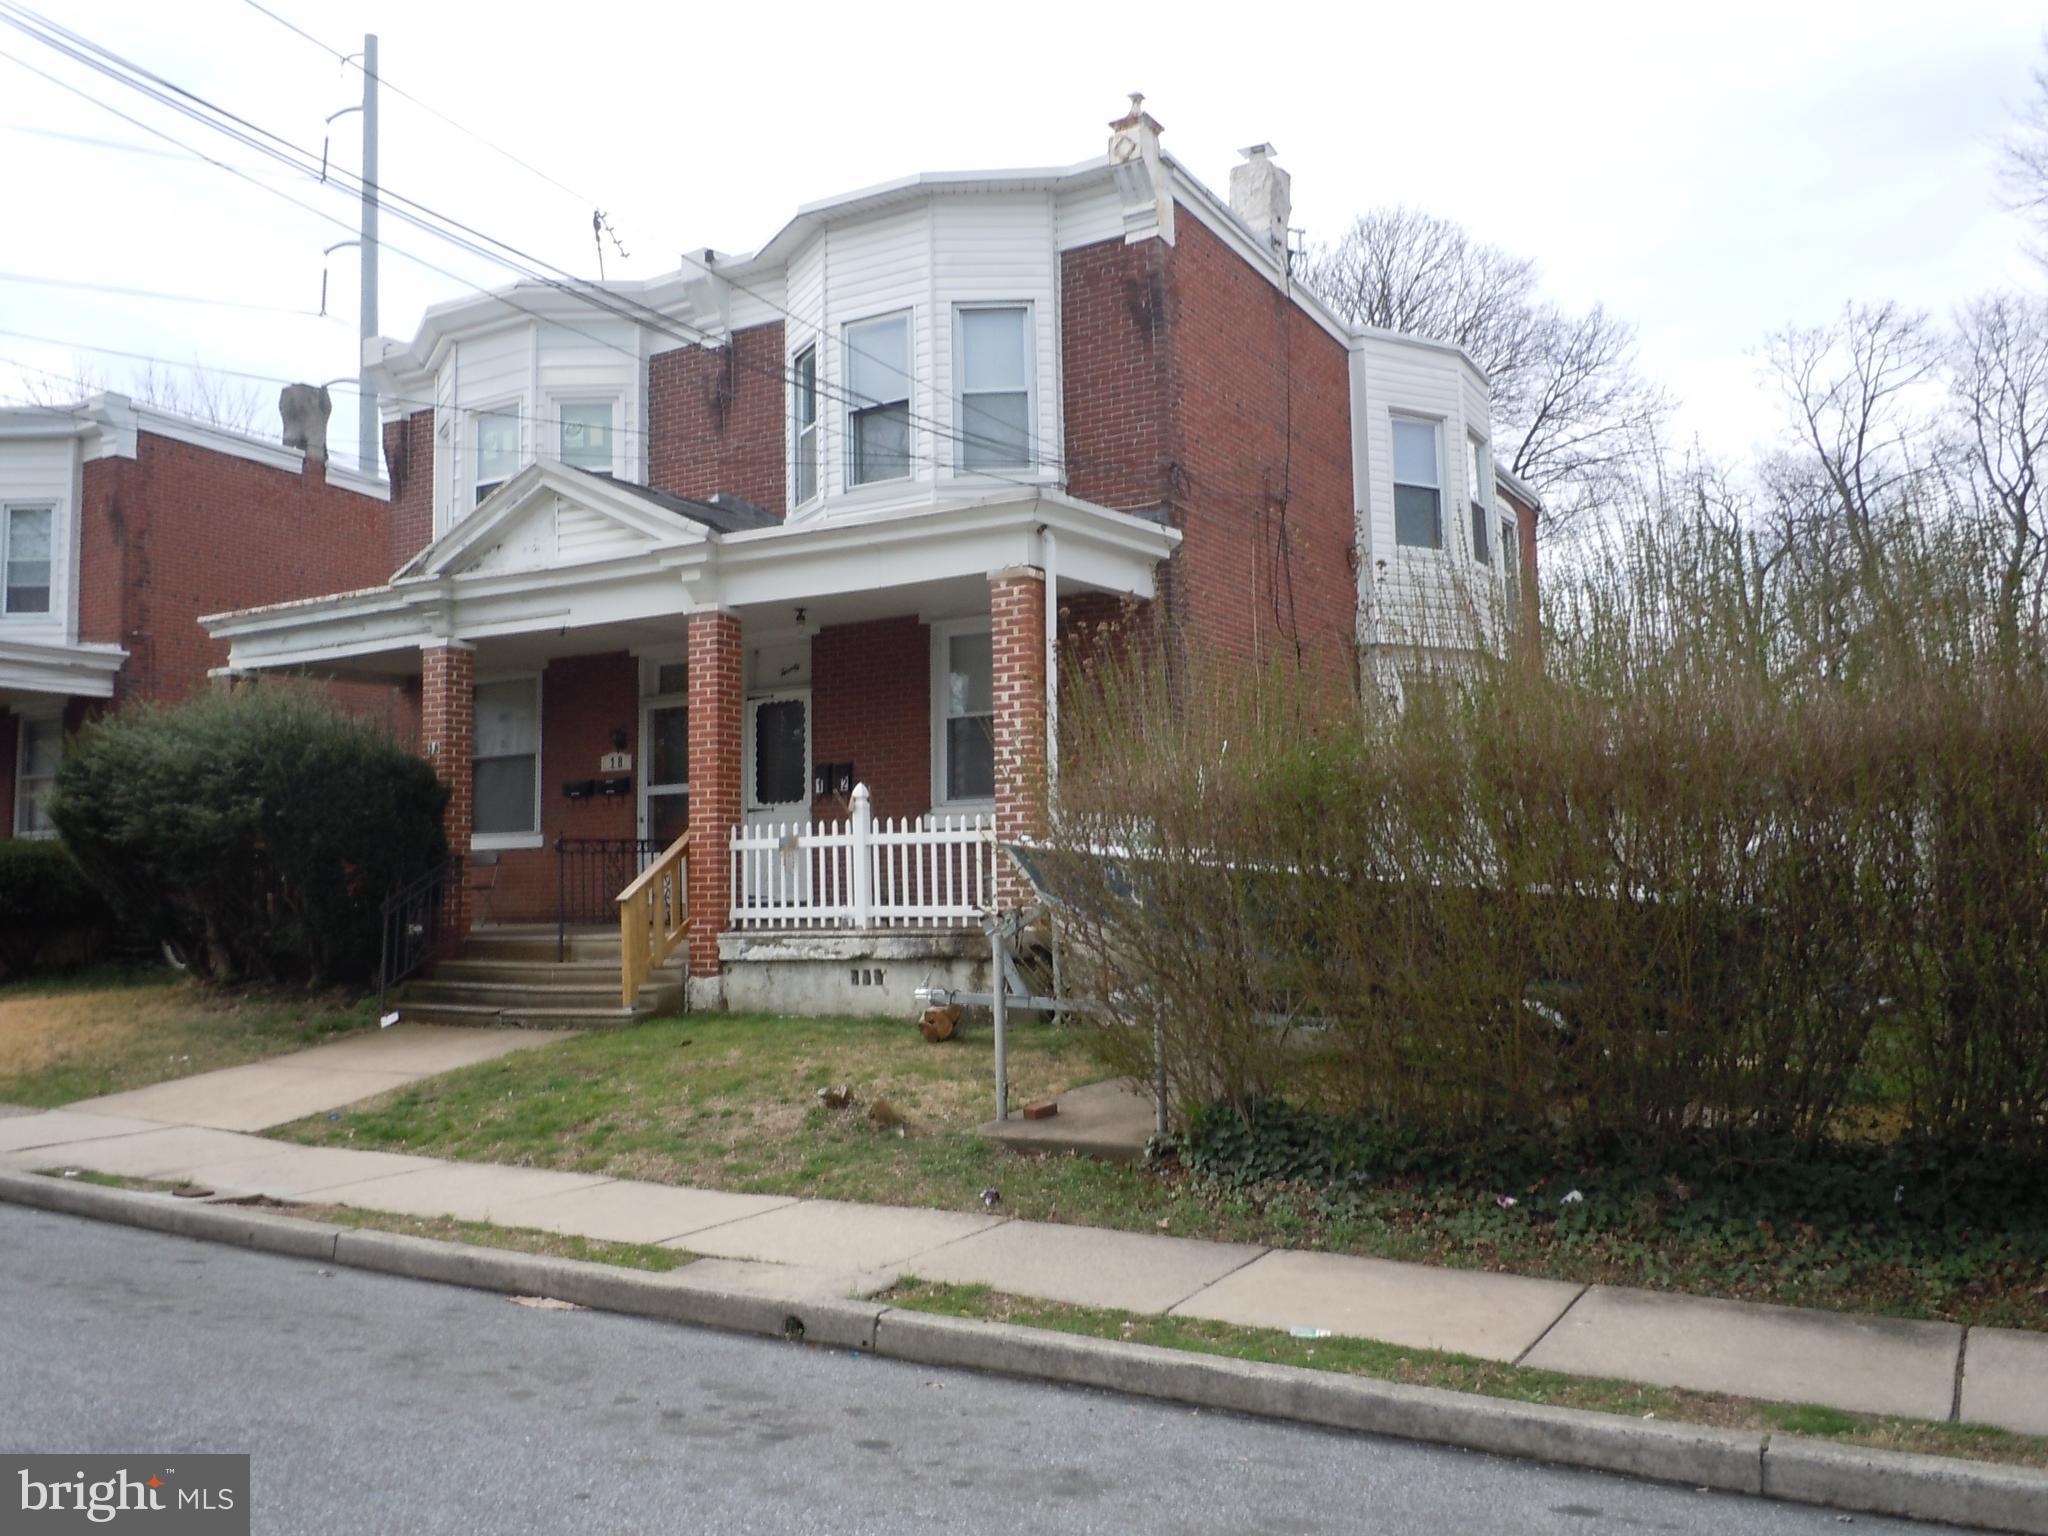 20 Cherry Street, Darby, PA 19023